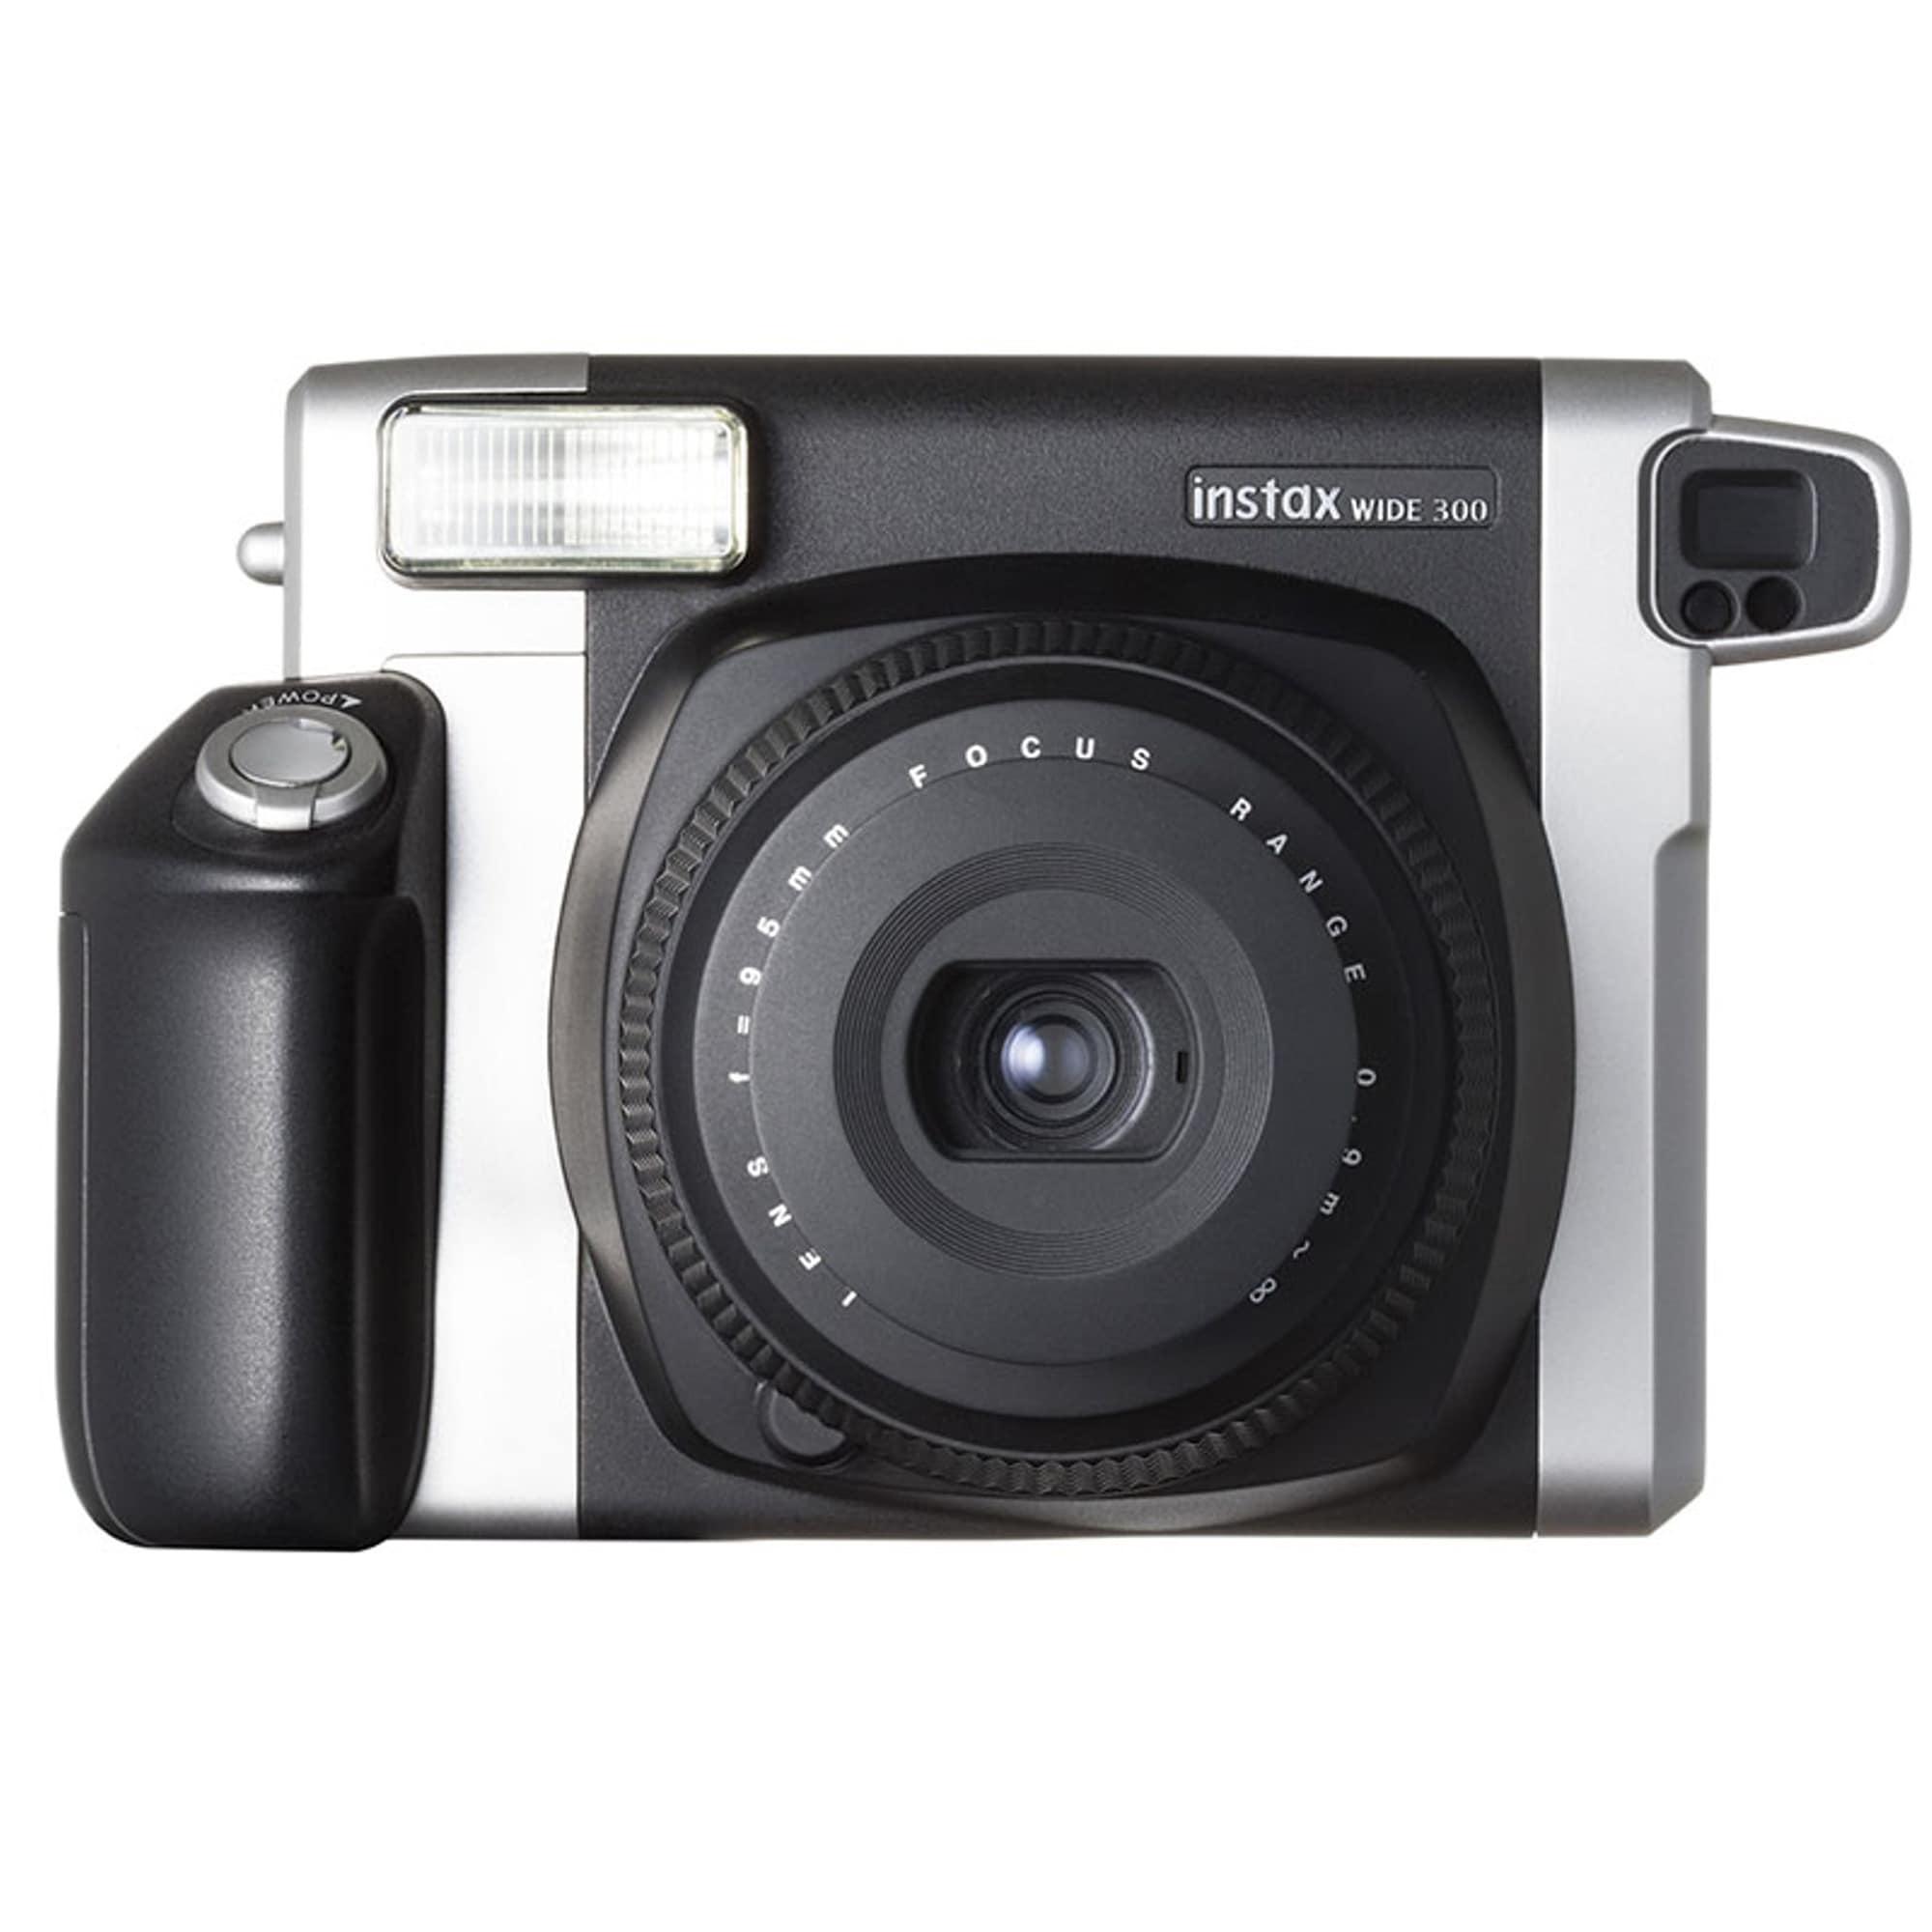 Fujifilm Instax Wide 300 - DEMO EX